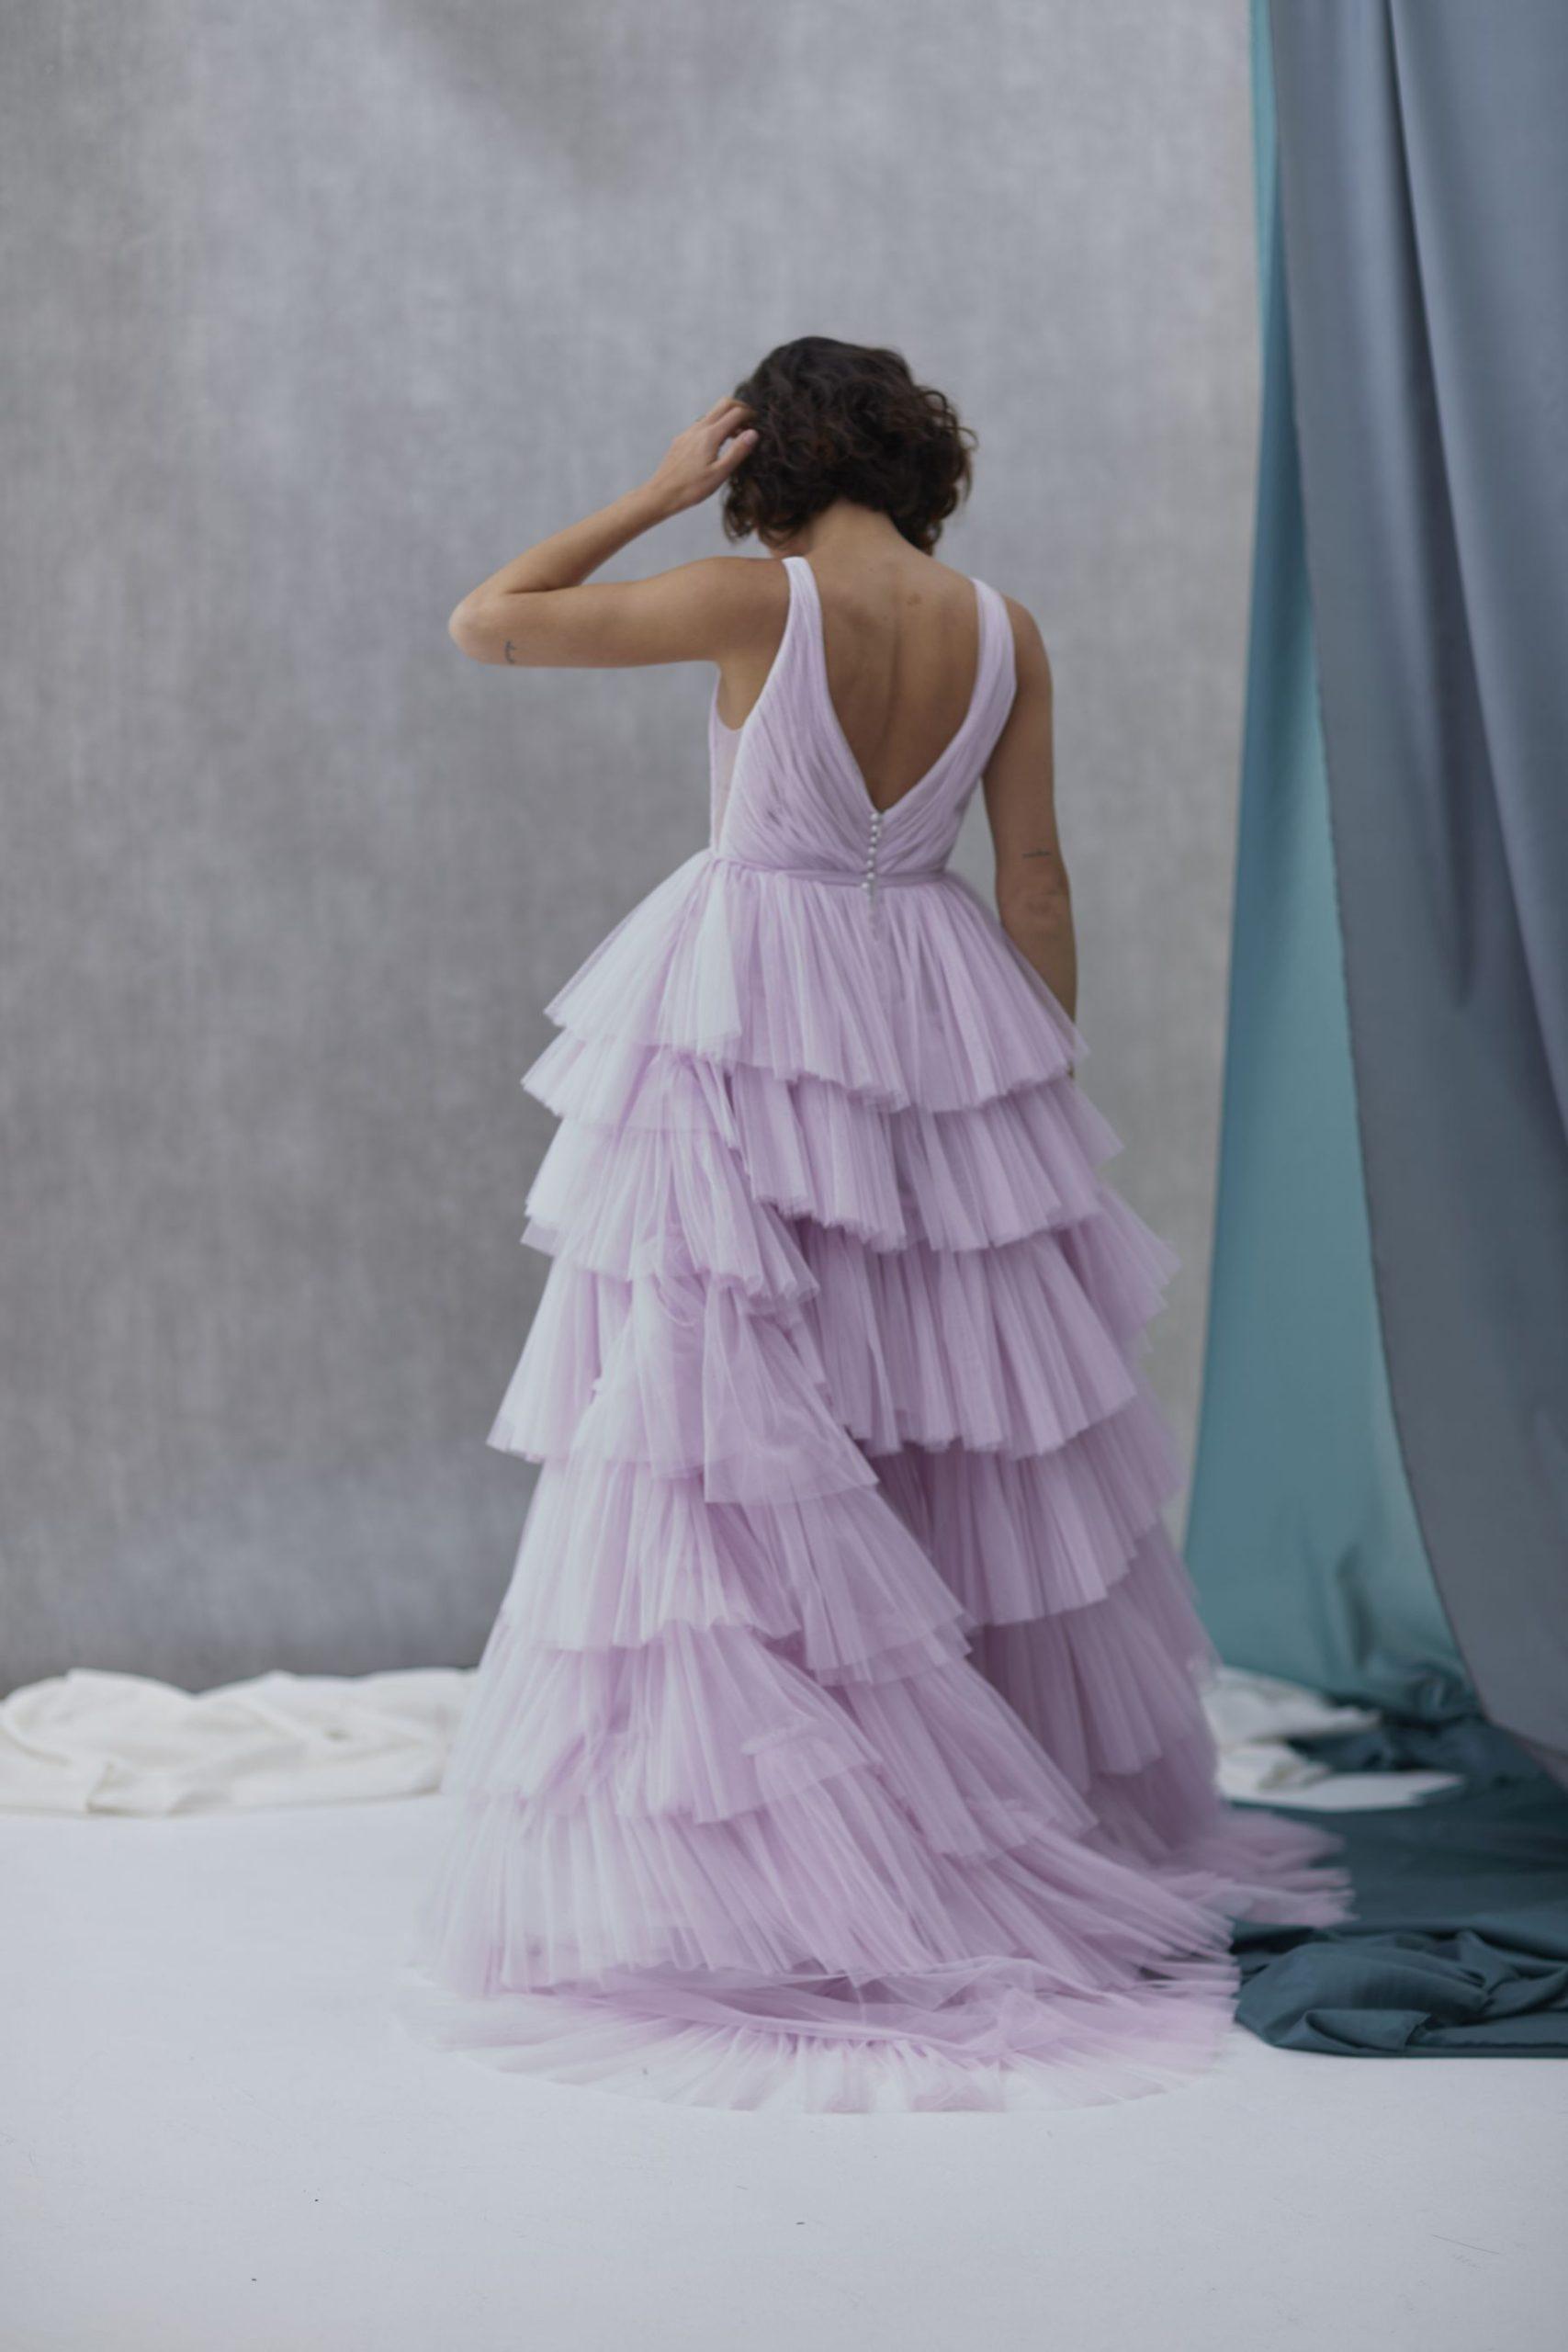 Le Lilac Pink Hera_July2021_Shot1_0059